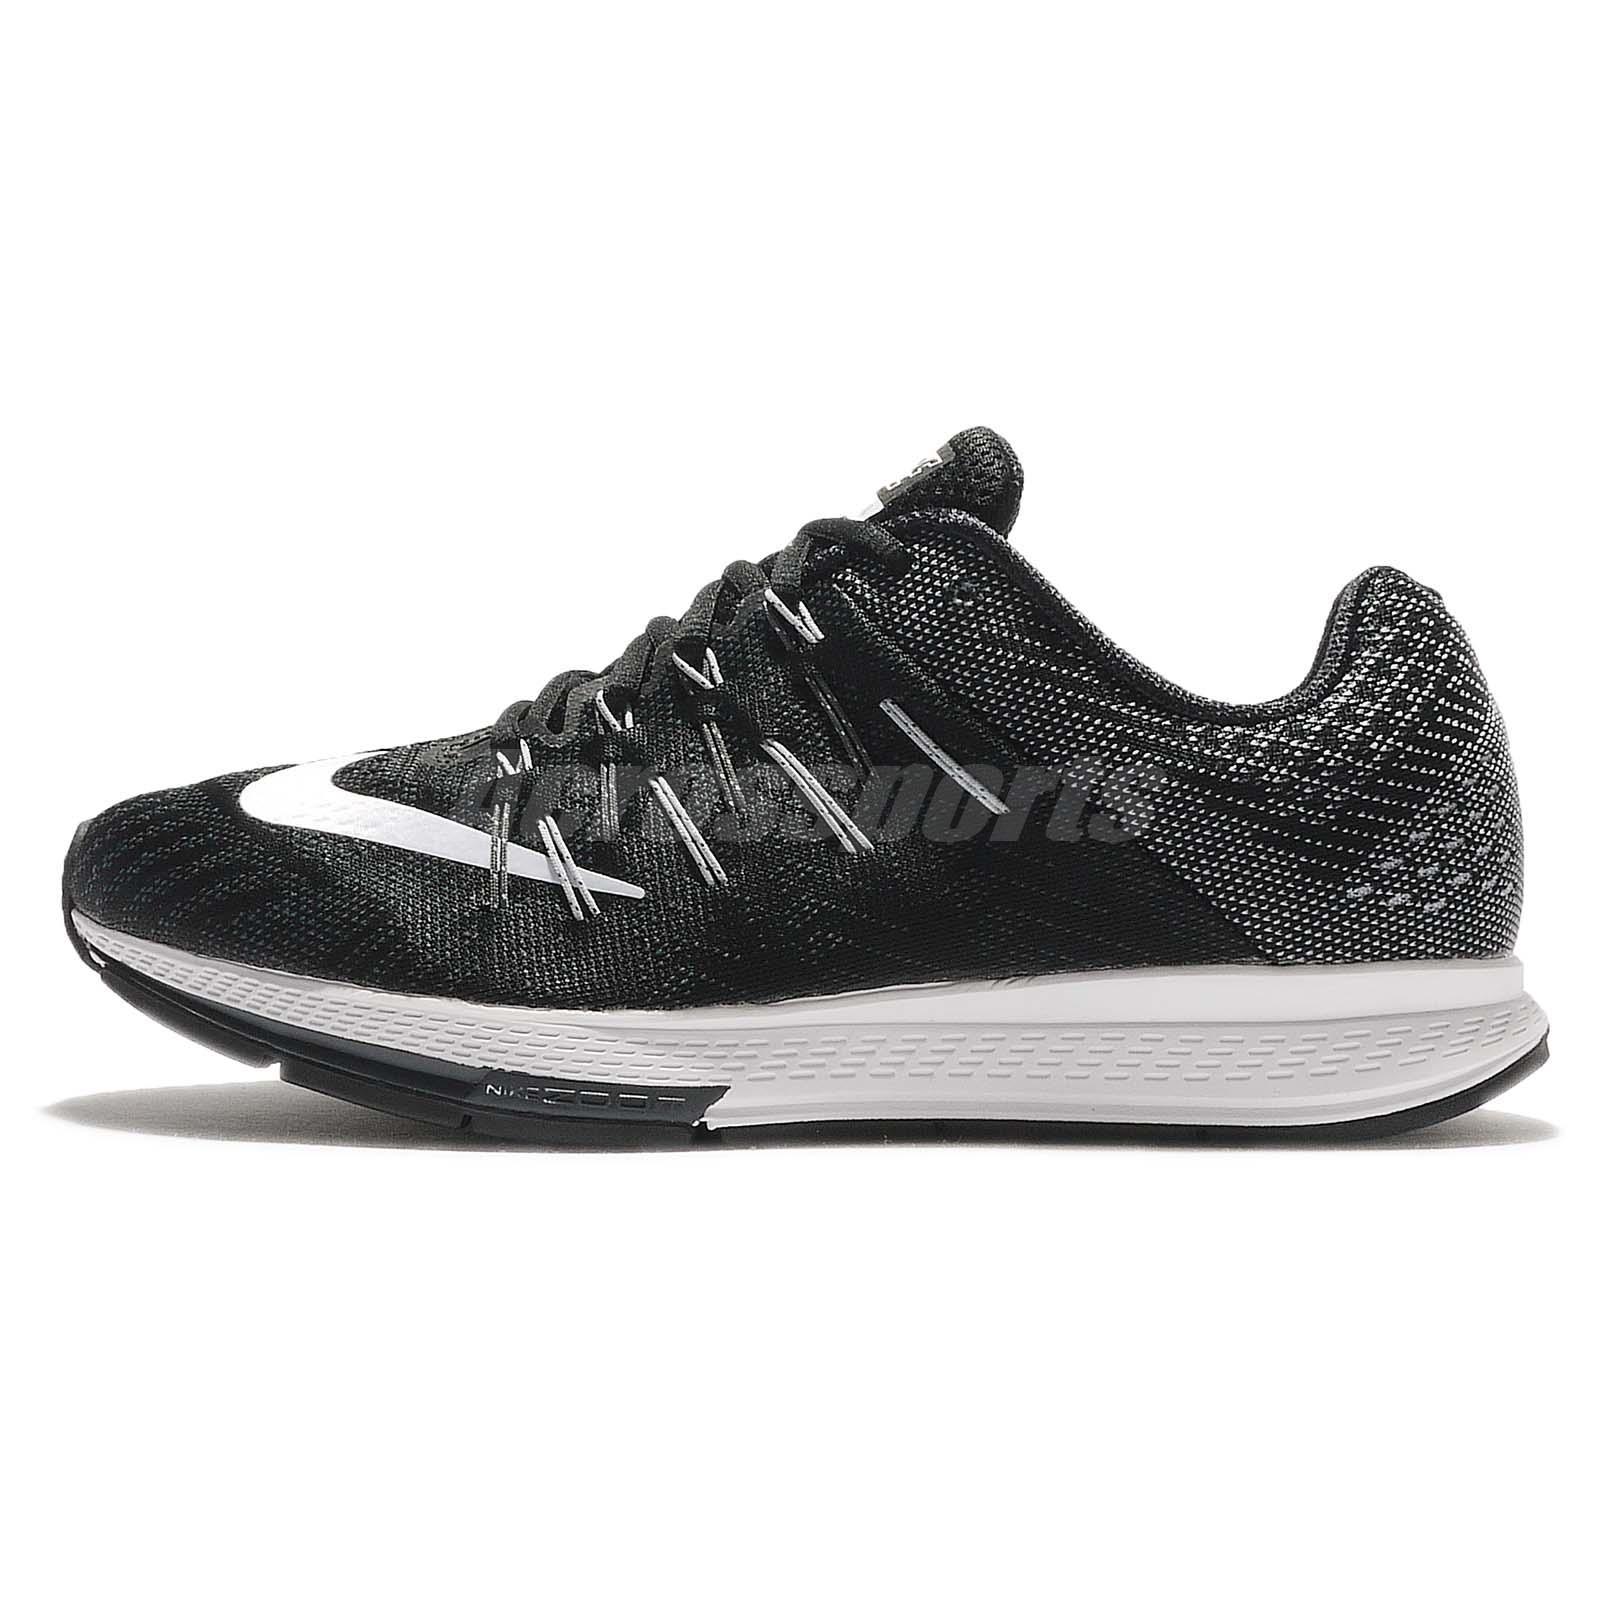 Nike_Air_Zoom_Elite_8; Nike Air Zoom Elite 8 VIII Black Grey White Men  Cushion Running Shoes 748588-010